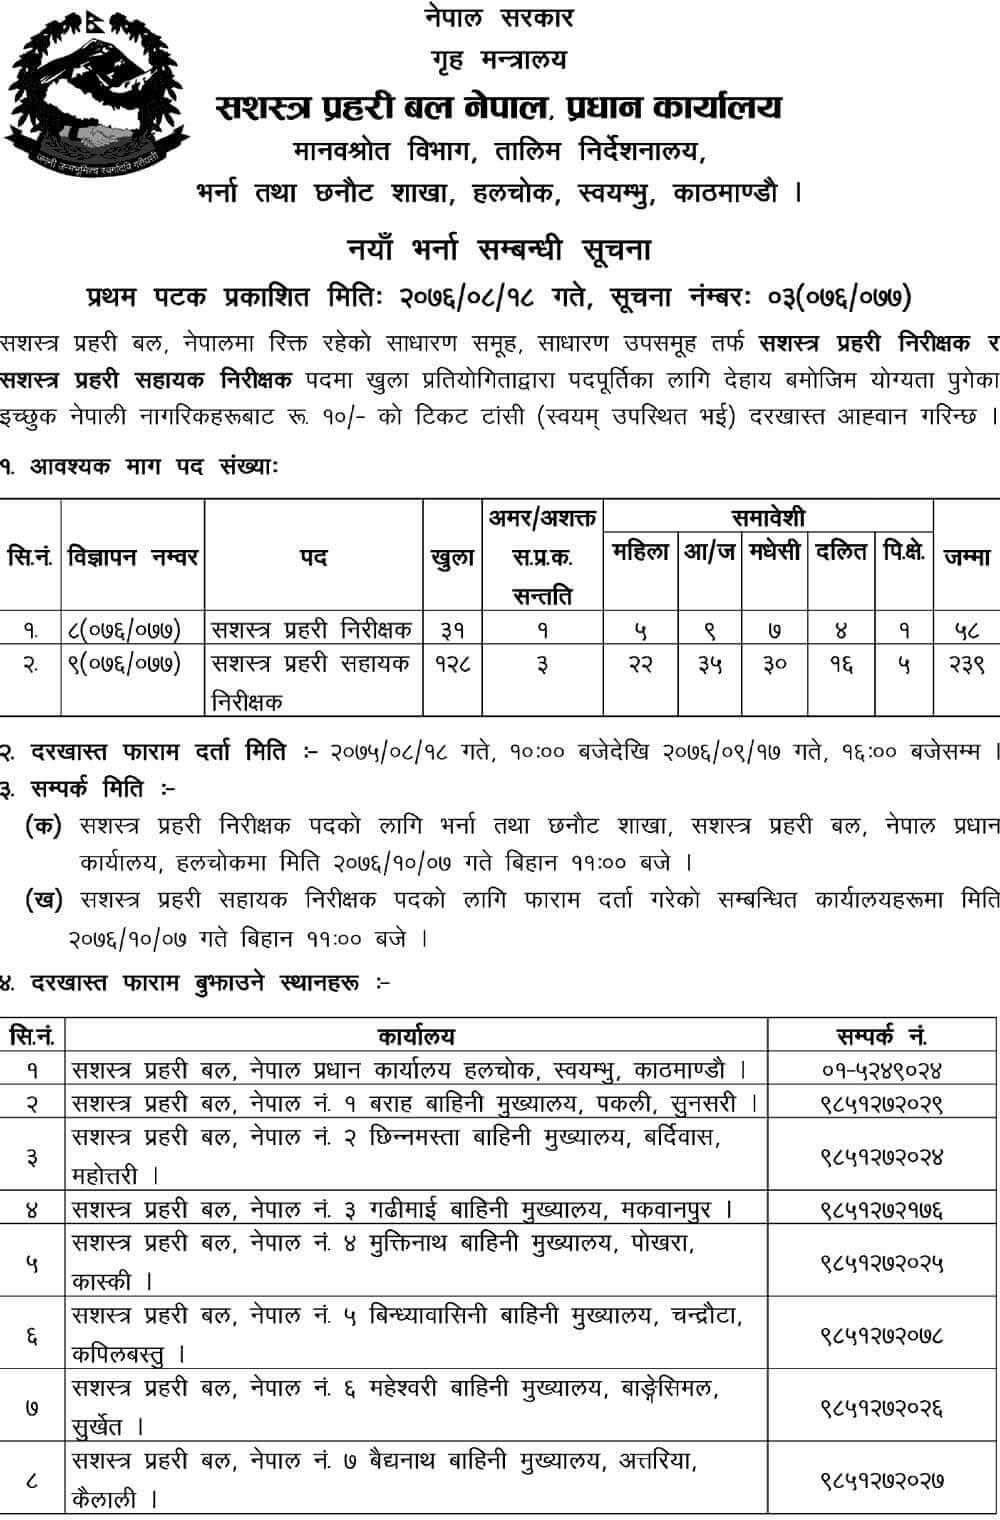 Armed Police Force Nepal Vacancies